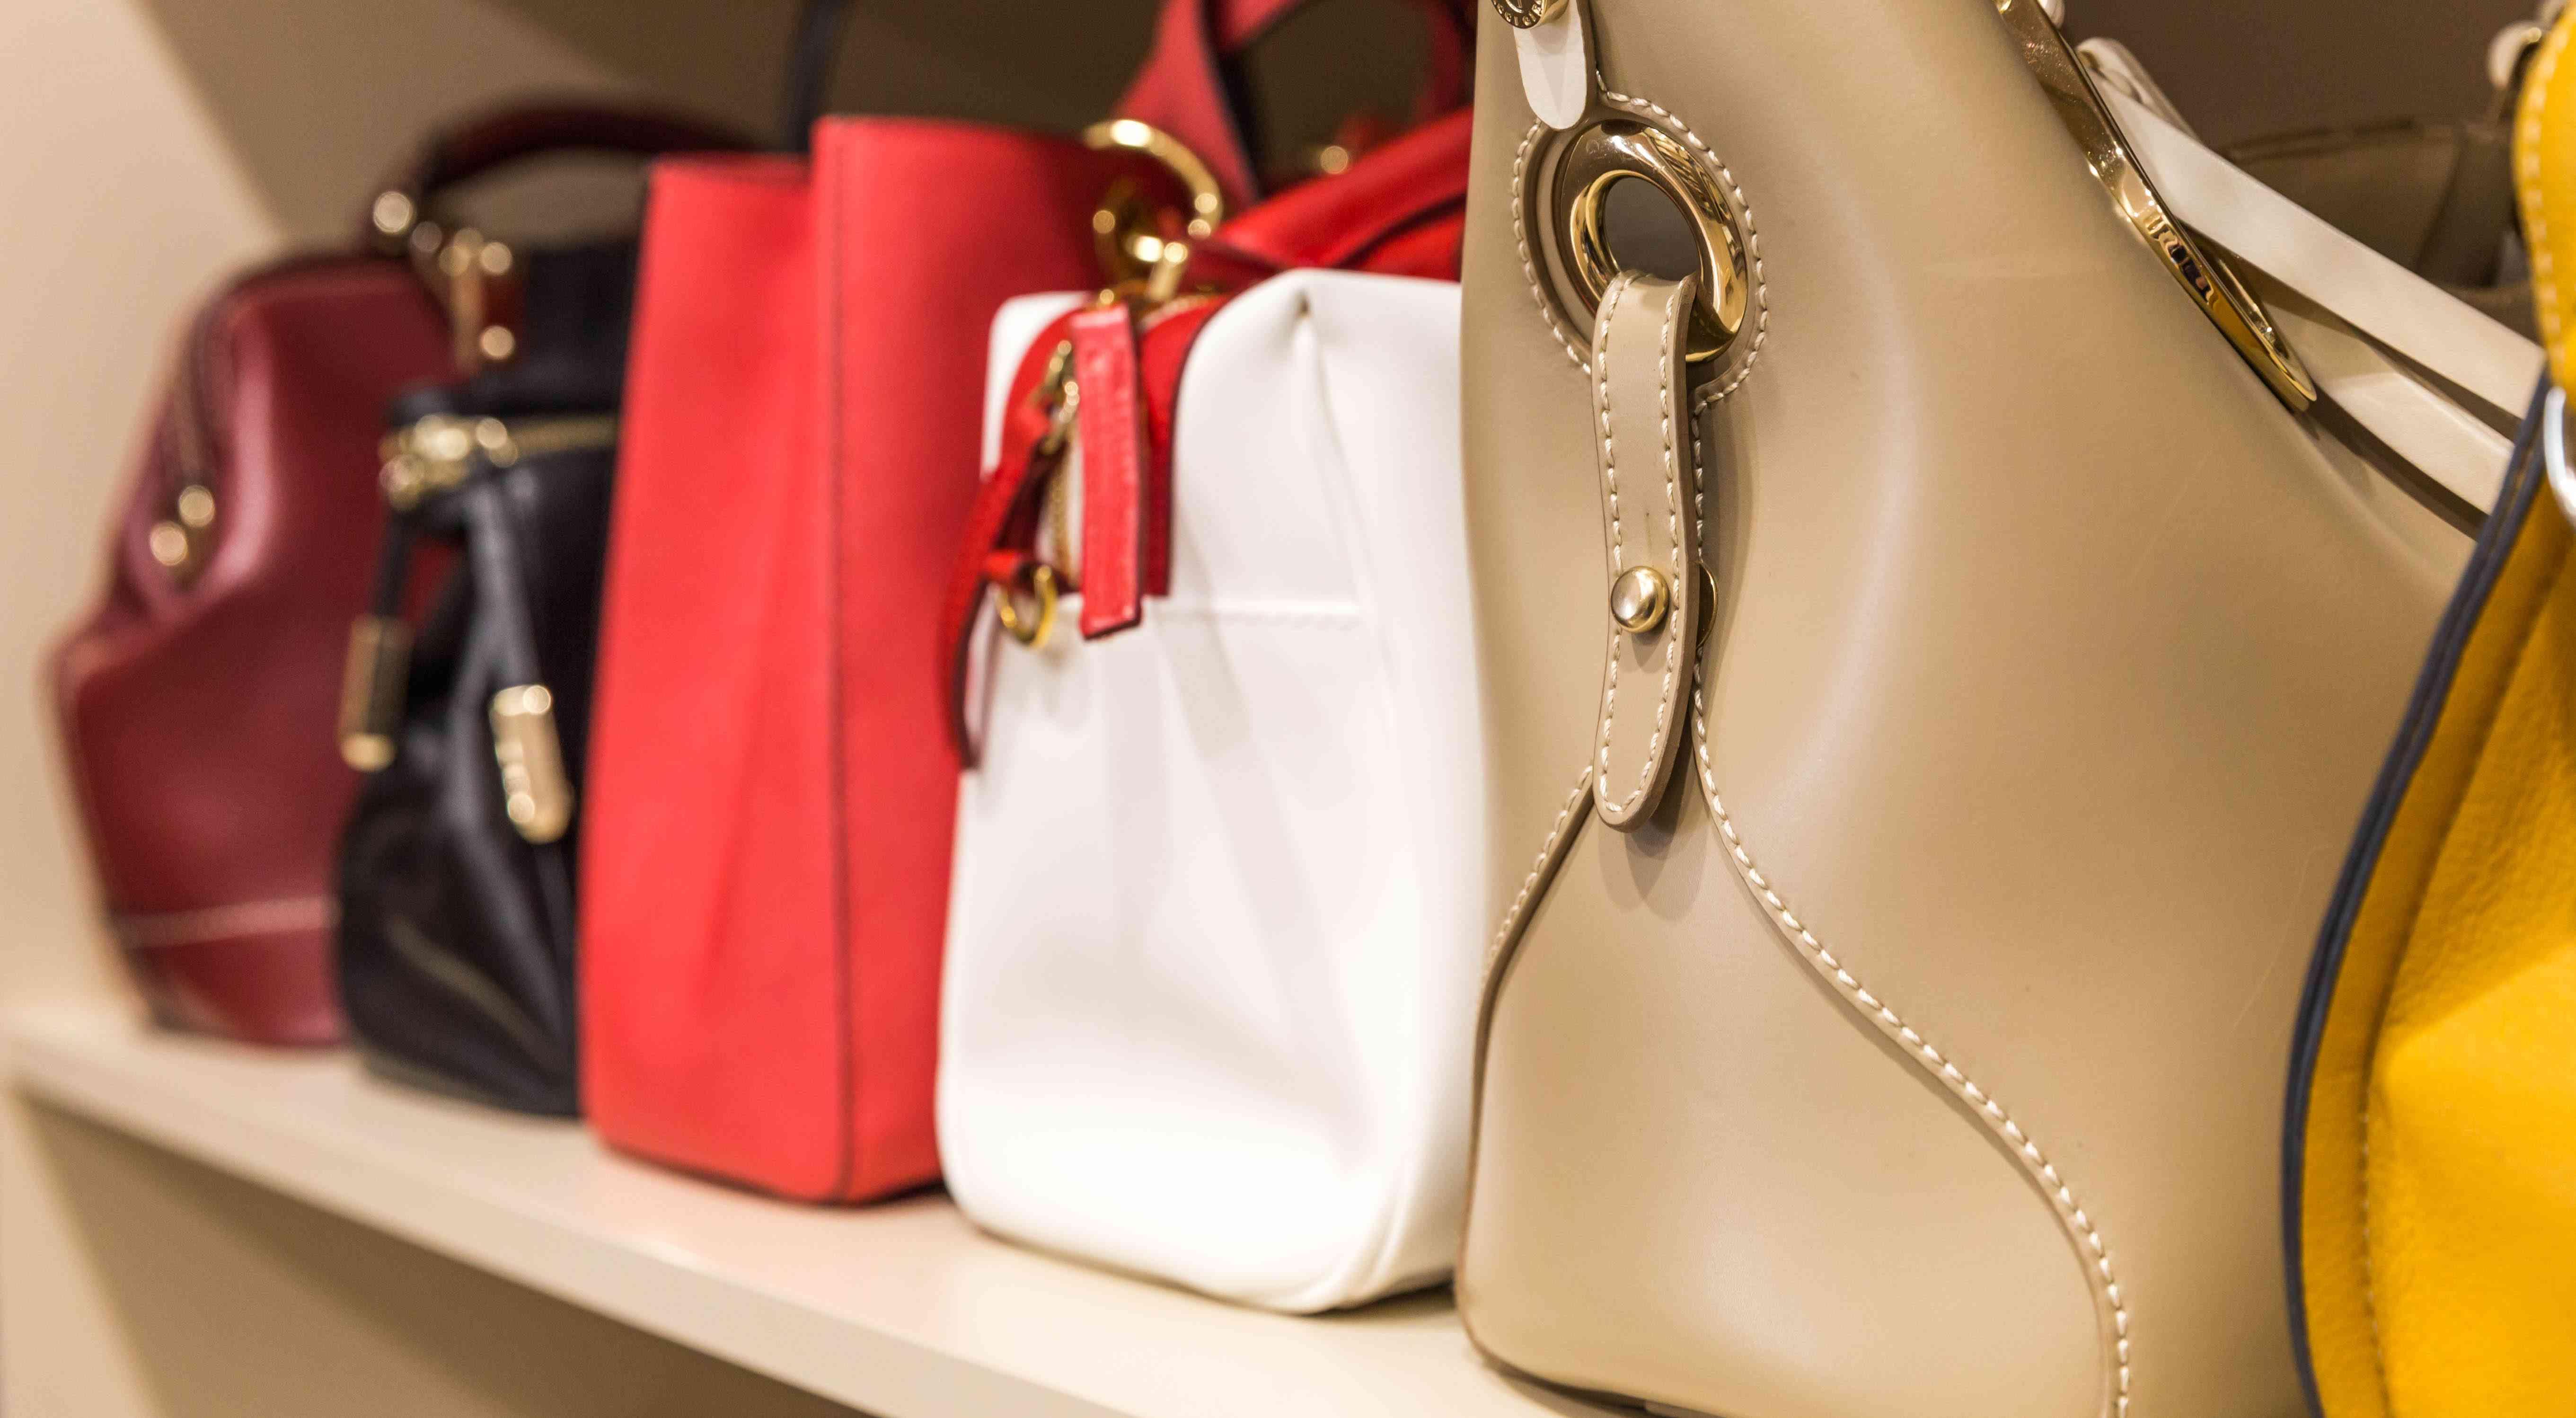 collection of handbags on a shelf